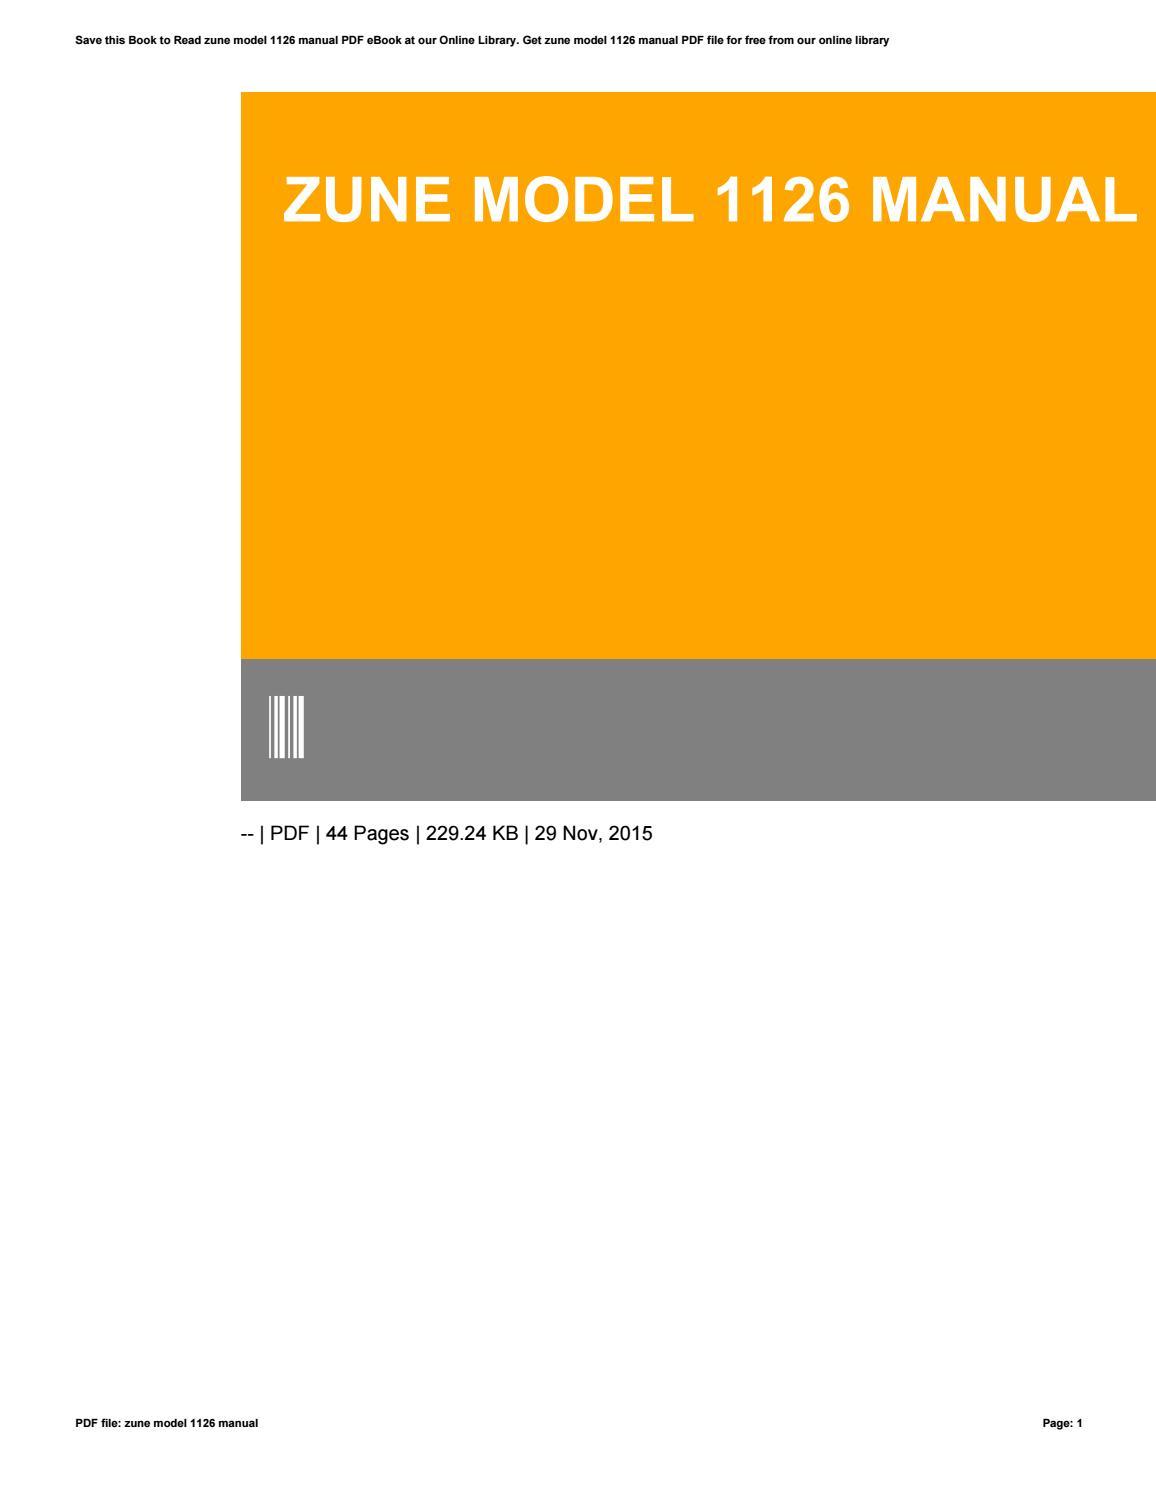 Zune model 1126 manual.